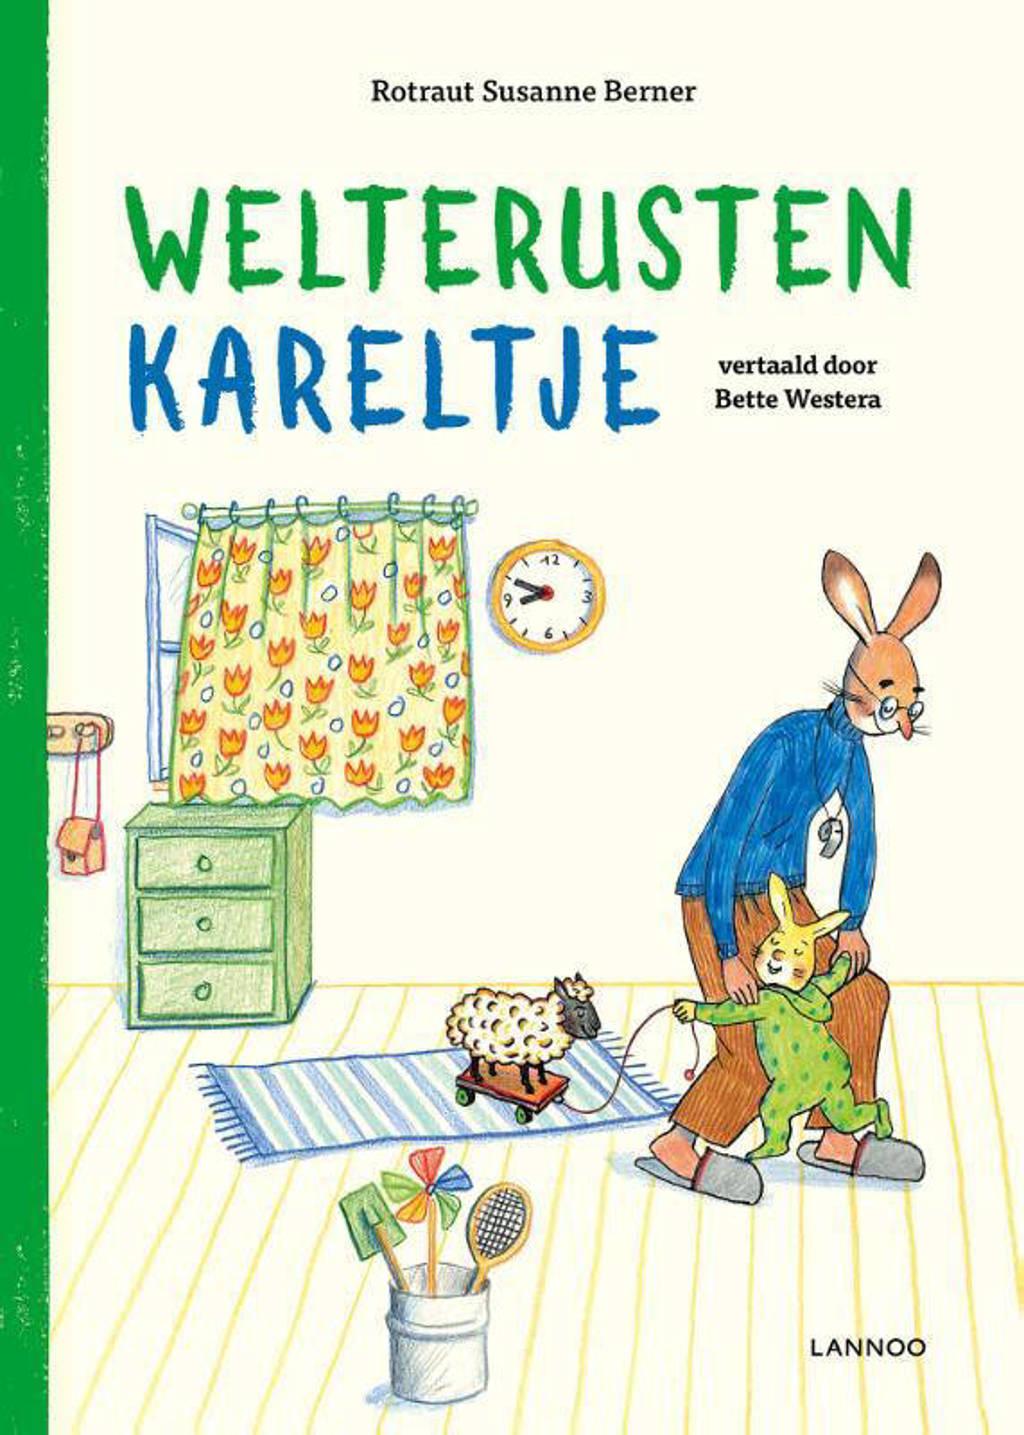 Welterusten Kareltje - Rotraut Susanne Berner